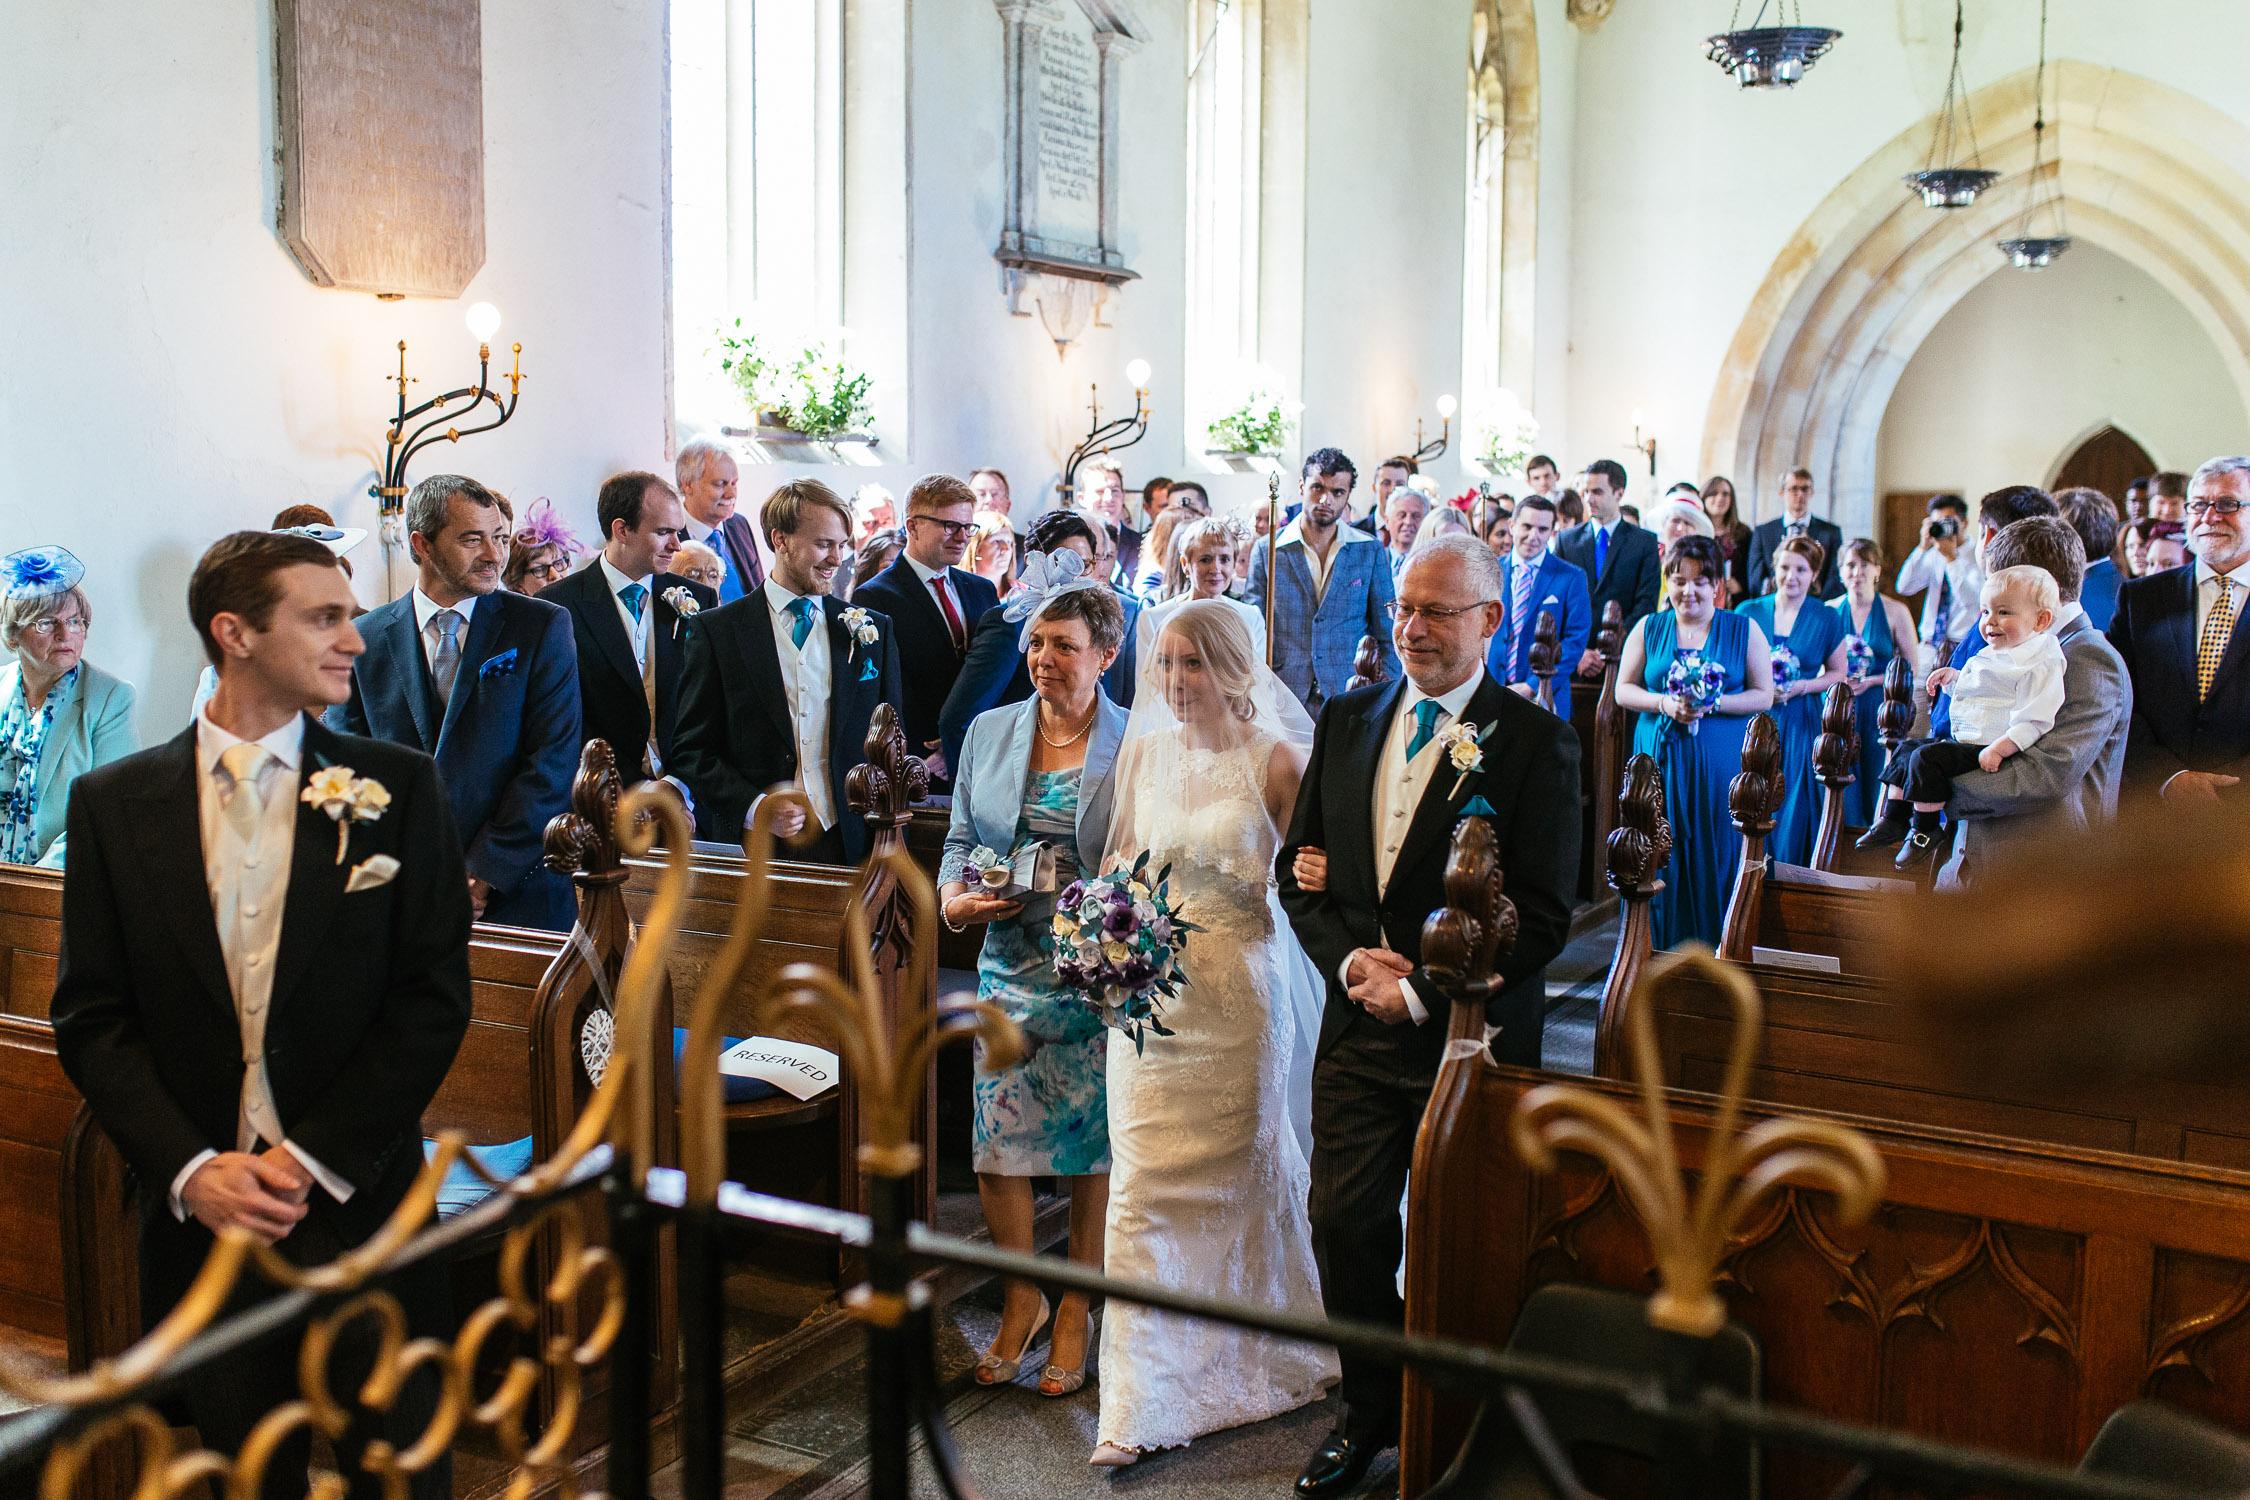 Lizi-and-Mark-Wedding-Highlights-25.jpg